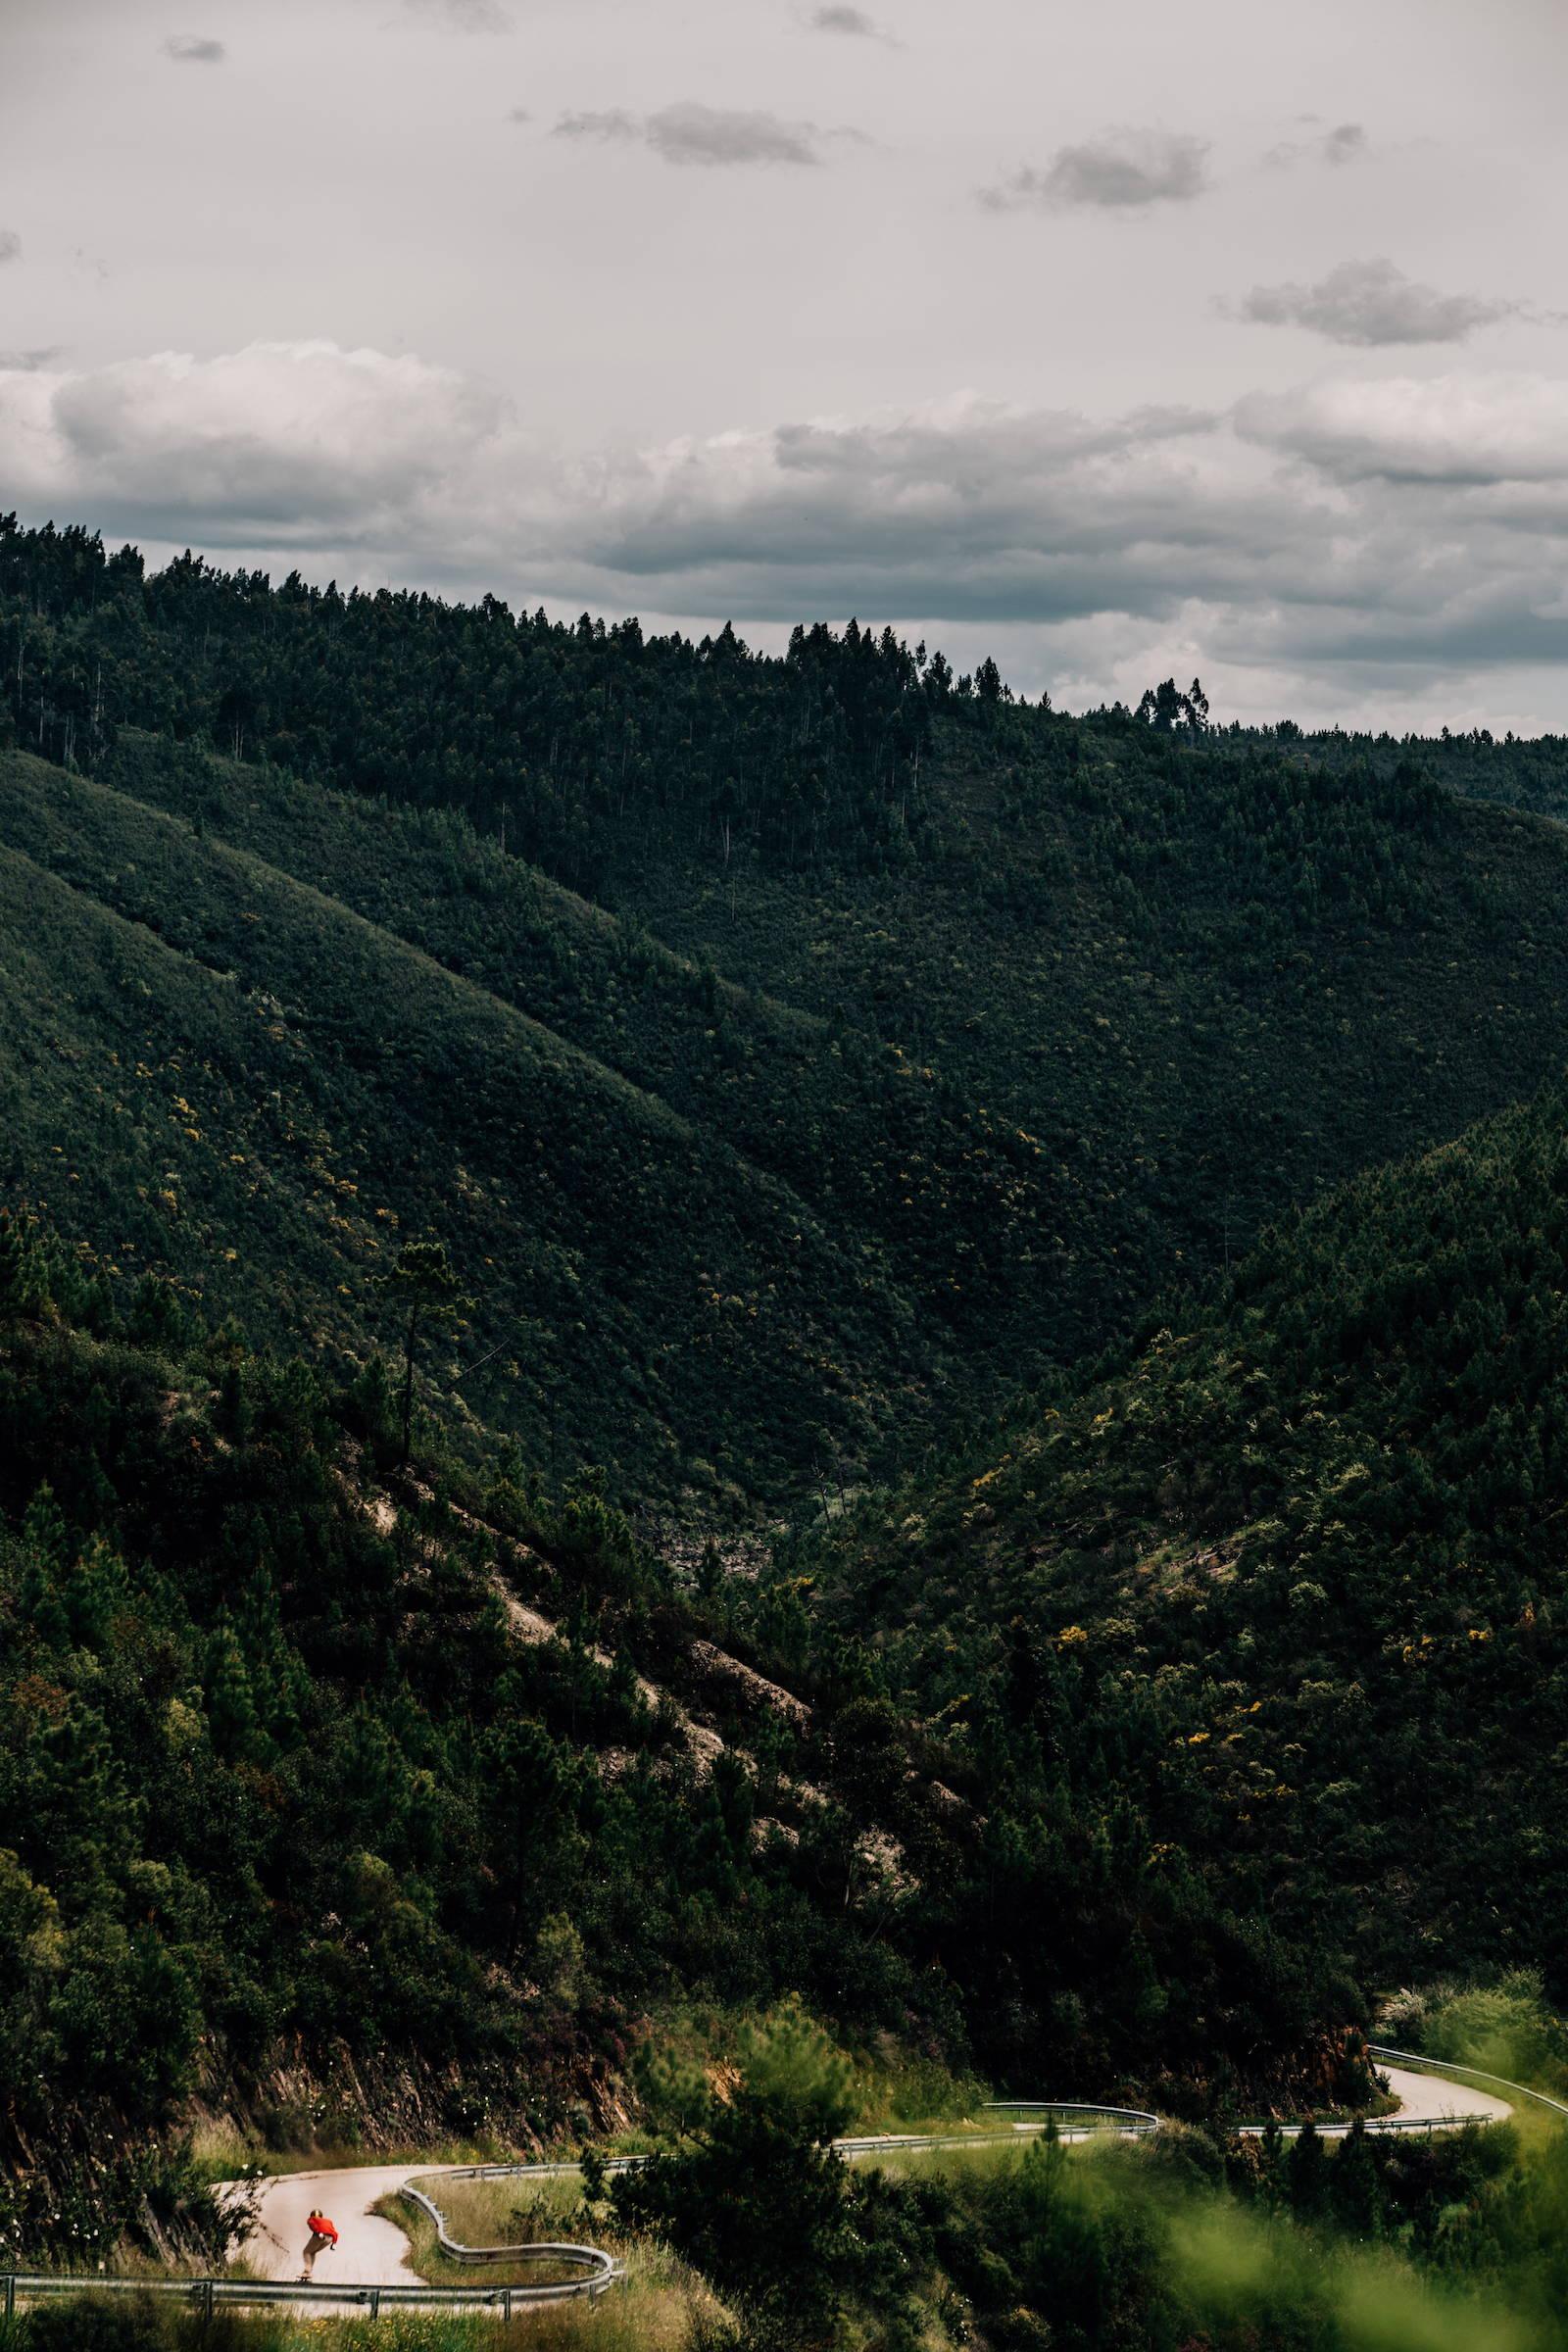 Mtn. Pursuits Serra Da Estrela Mountains Downhill